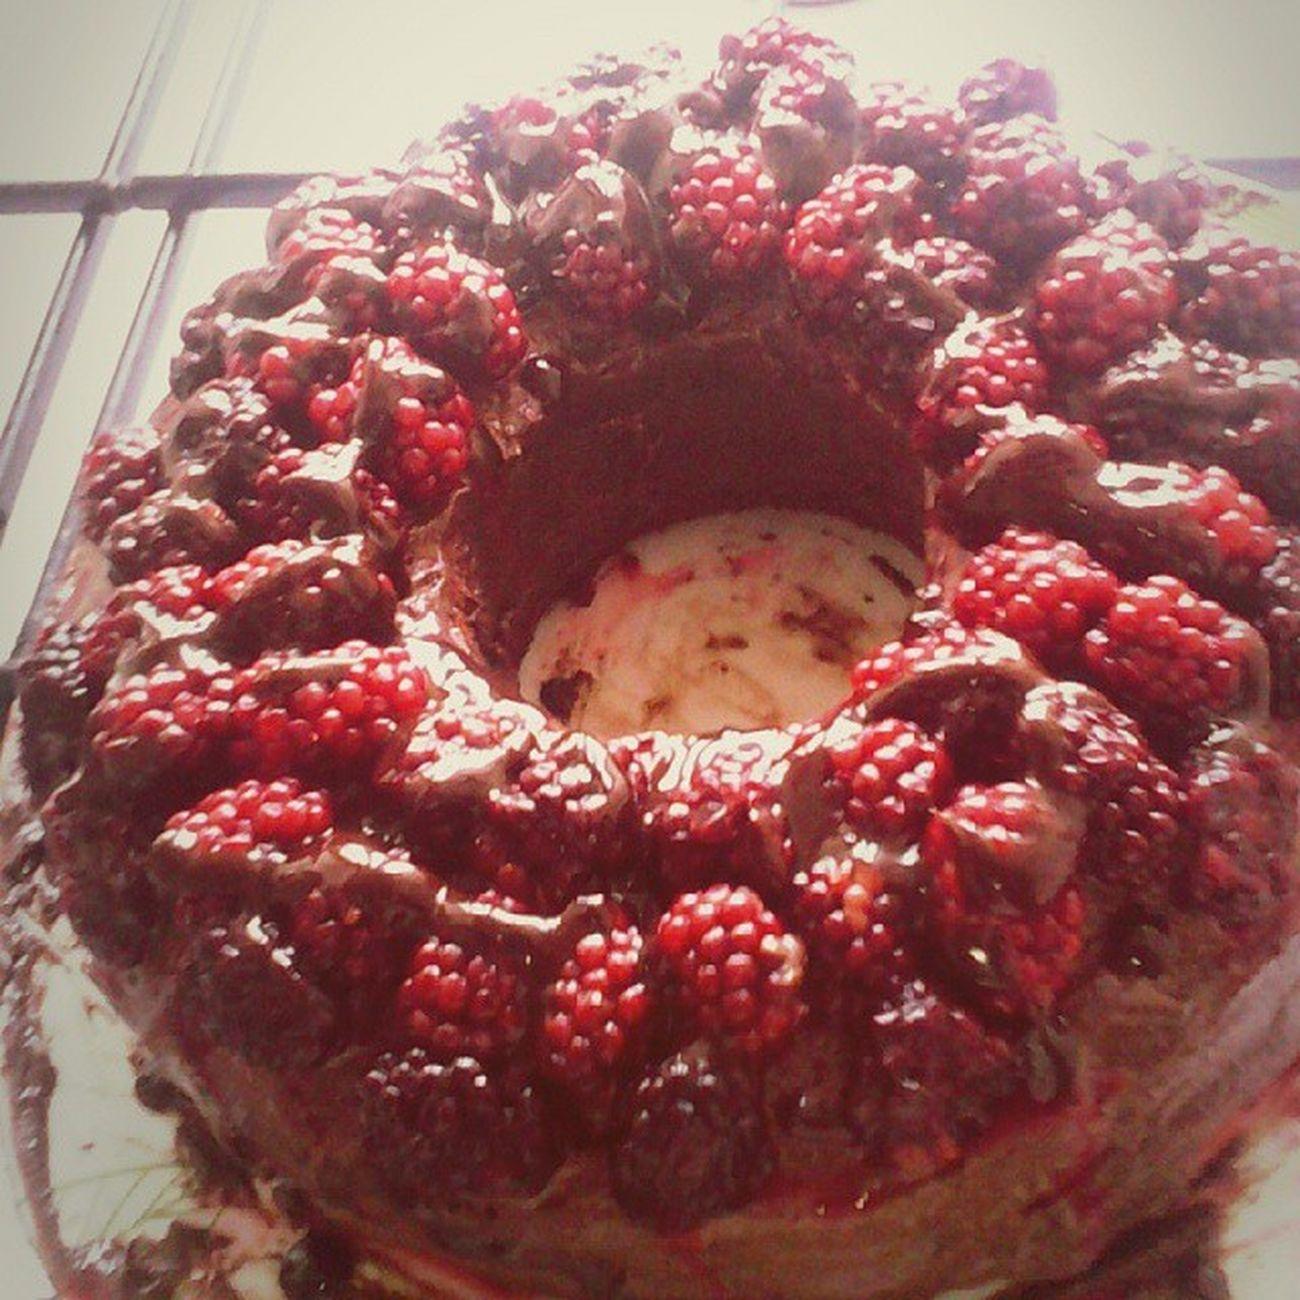 Yaptıgım En Güzel Pasta oldu happy life sweet